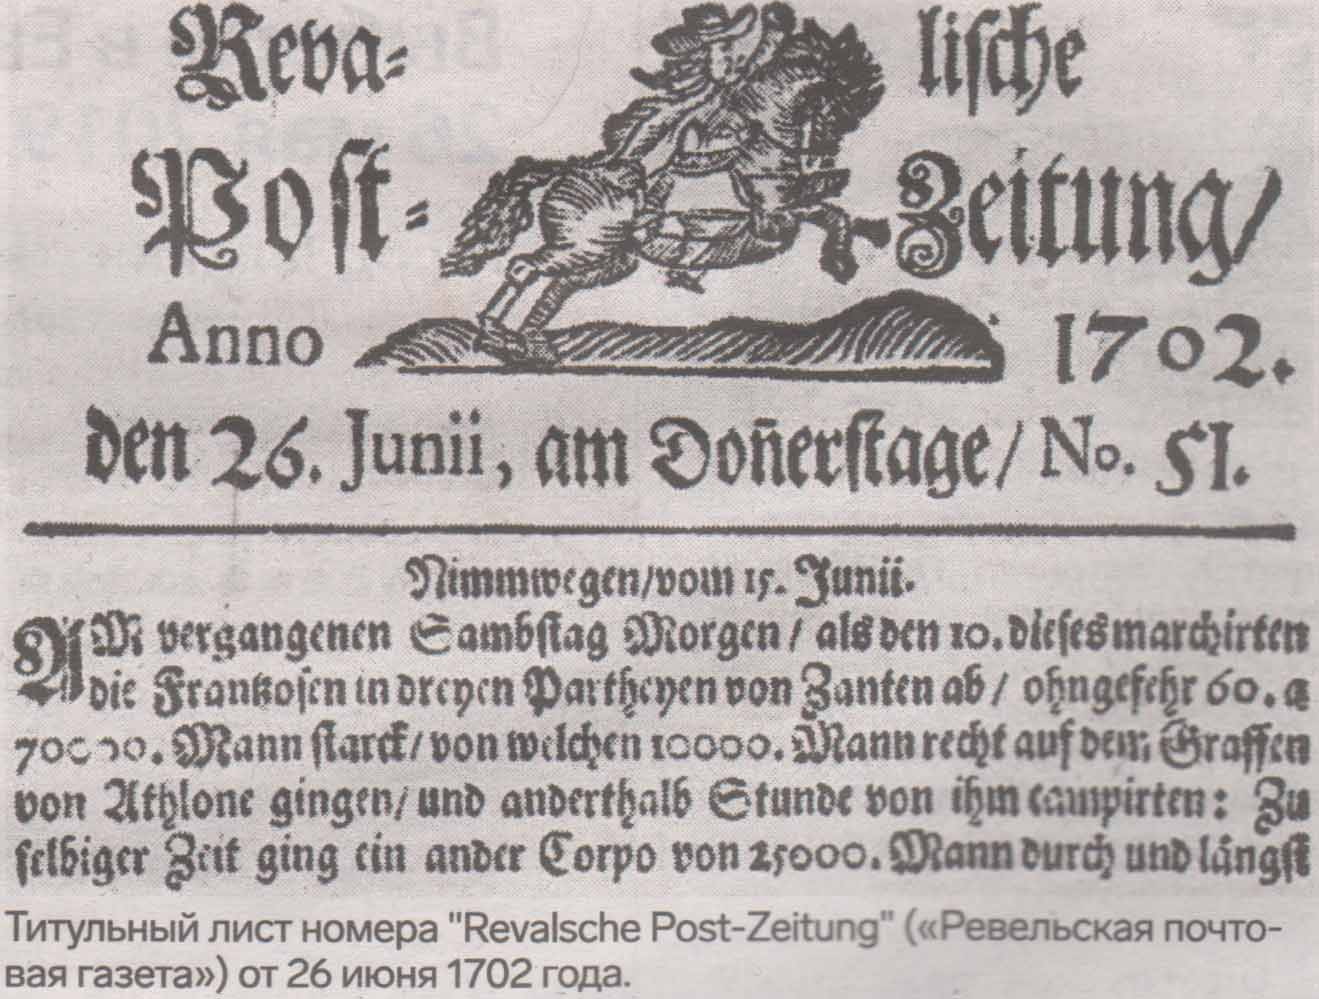 Юбилей таллиннской печати: 330 лет «Revalische Post-Zeitung»